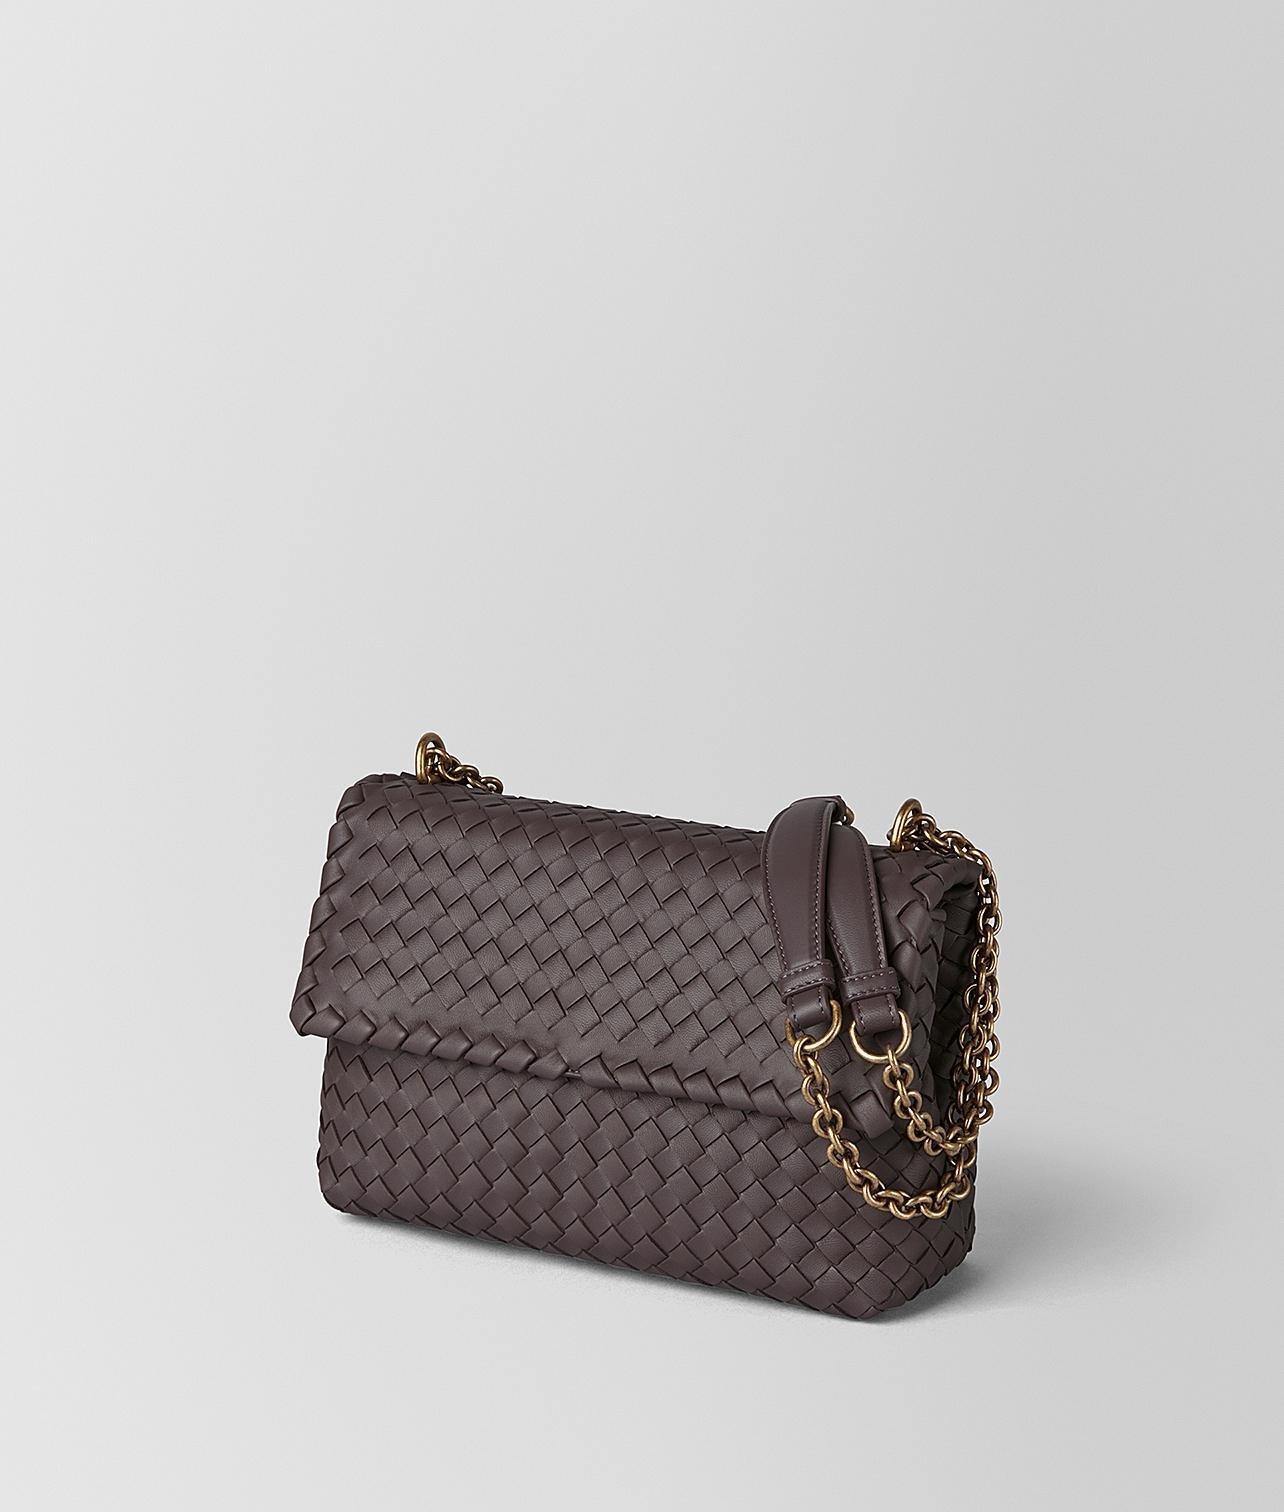 8946fbf25288 Bottega Veneta Small Olimpia Bag In Intrecciato Nappa - Lyst